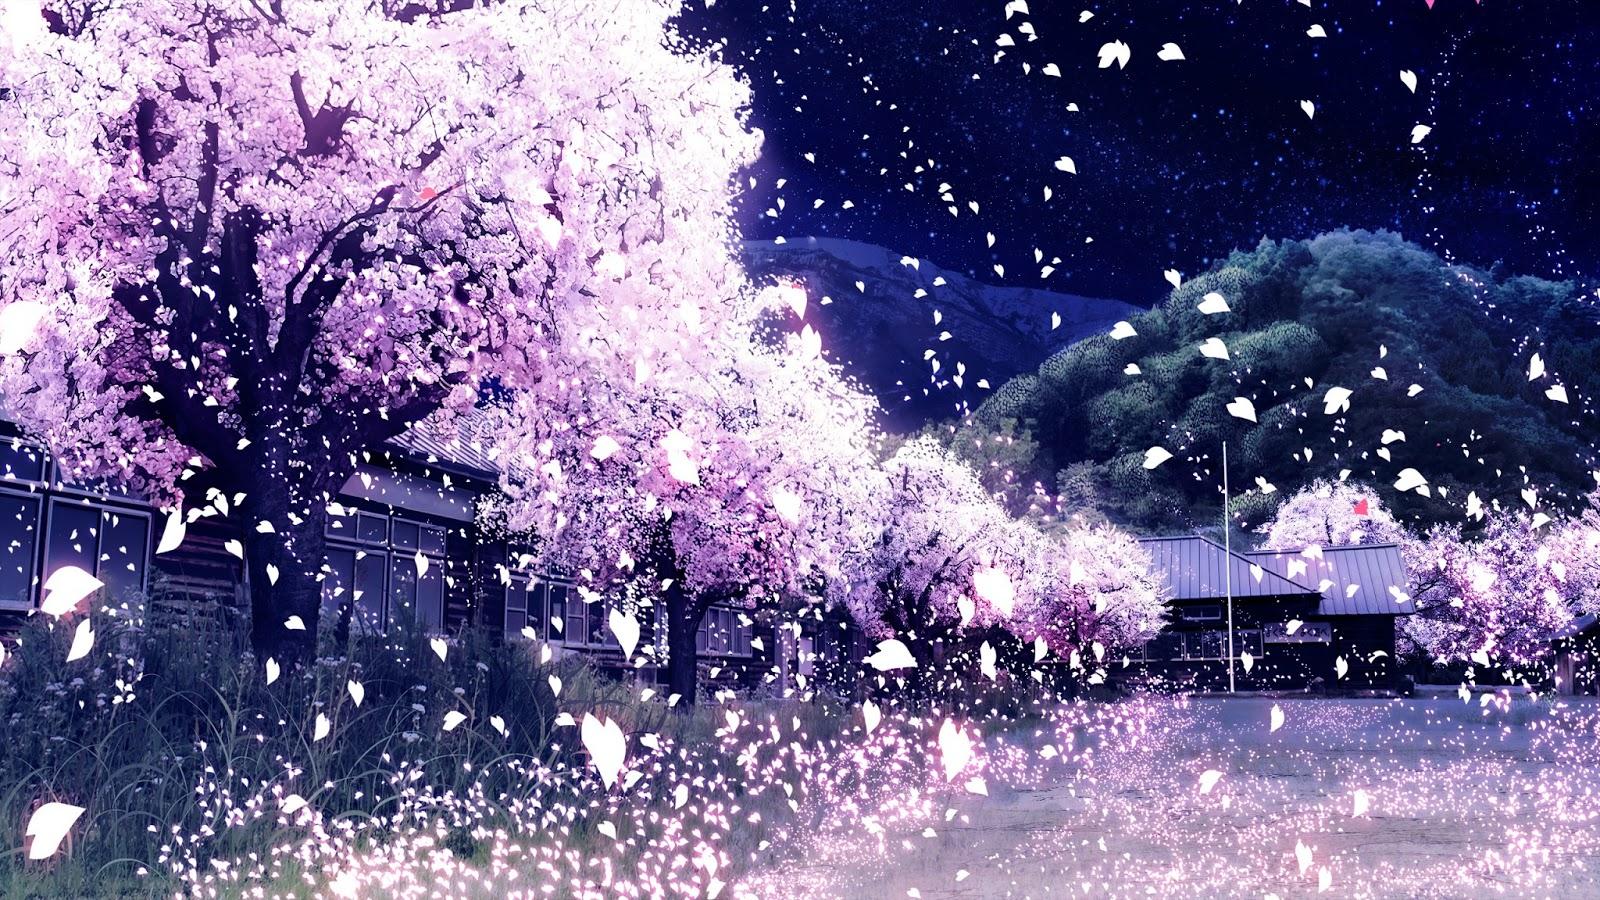 Anime scenery wallpaper wallpapersafari - Anime scenery wallpaper laptop ...